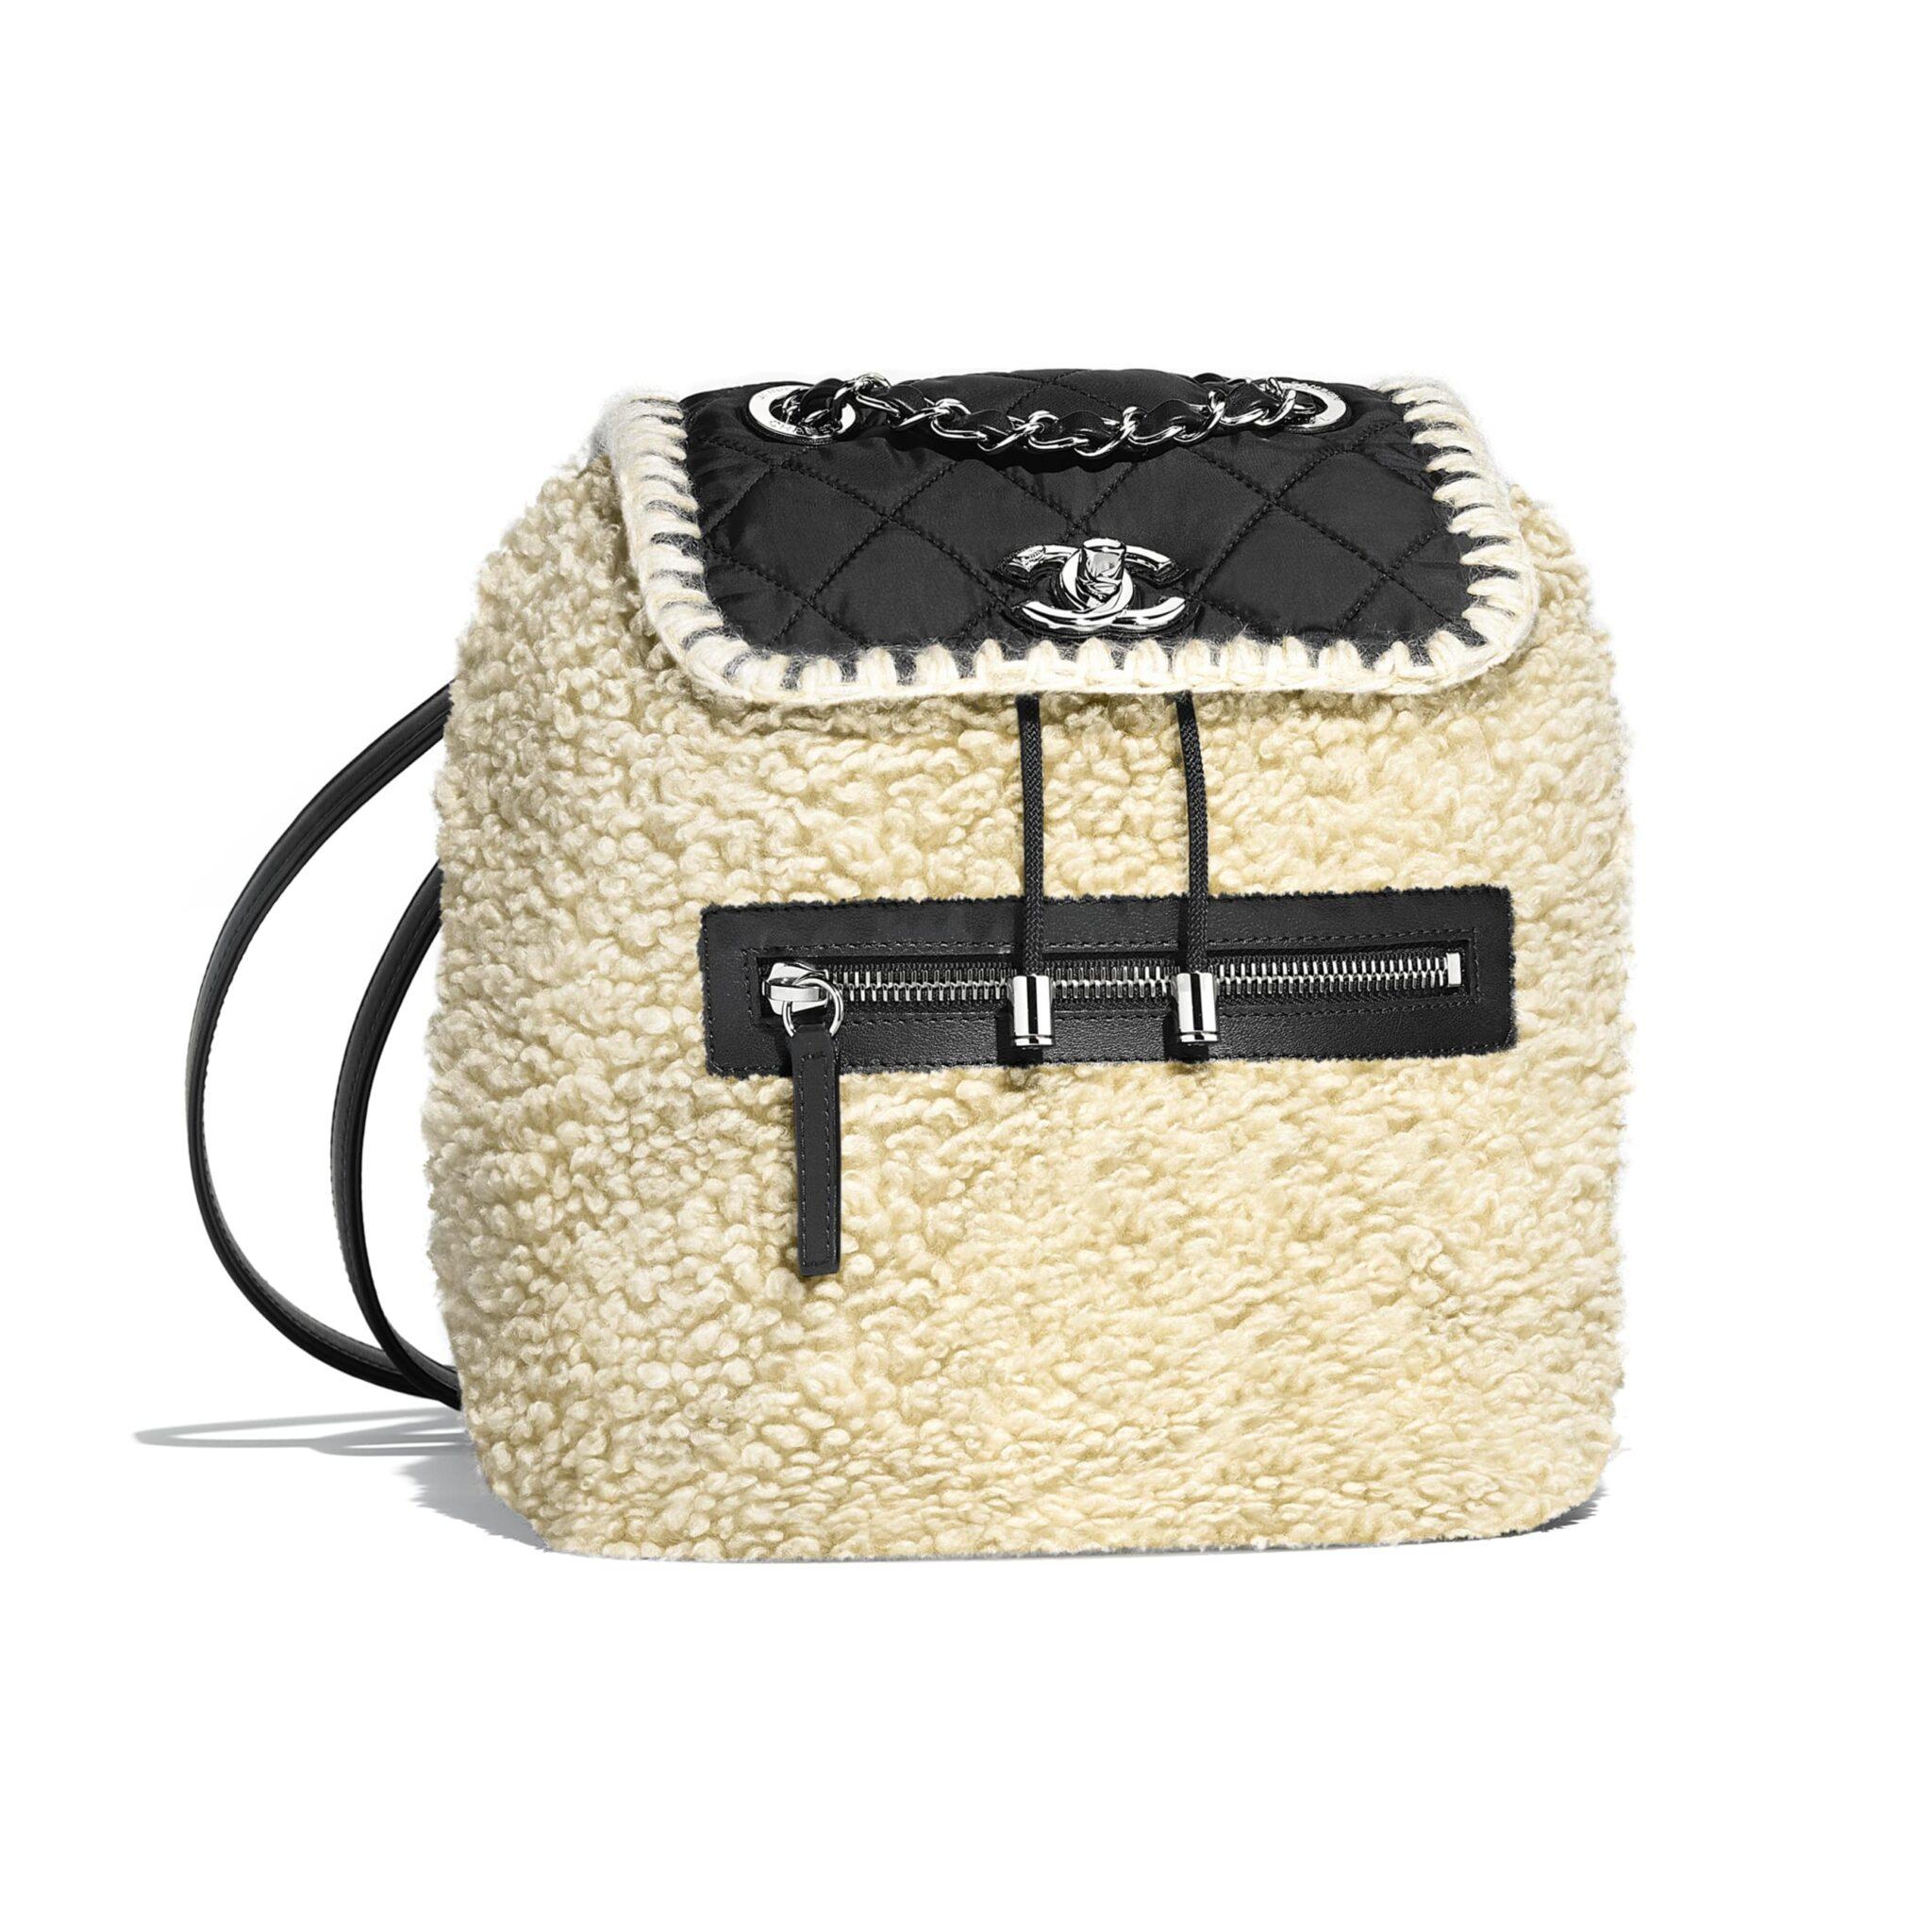 Image result for Chanel Wool-Nylon-Calfskin Backpack